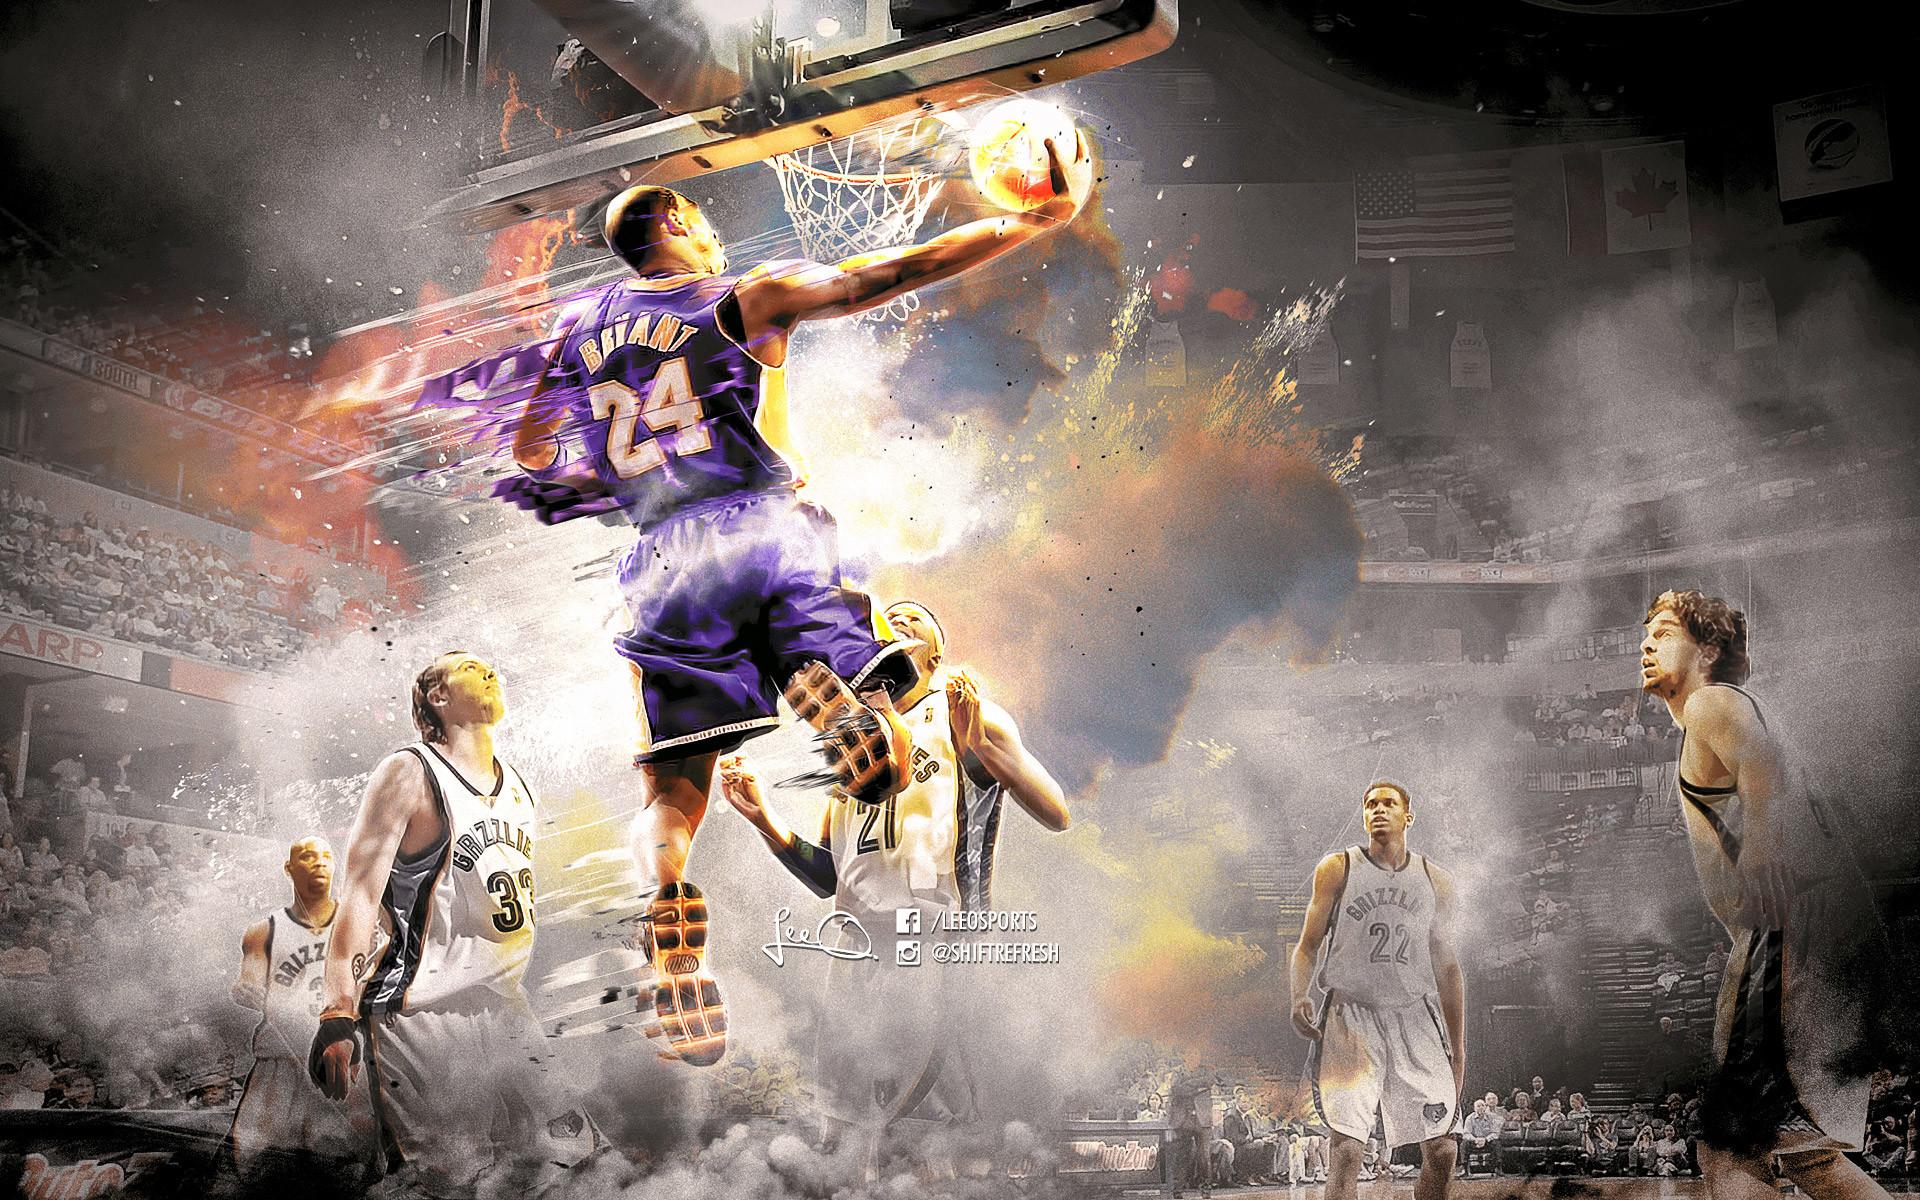 Kobe Bryant Dunk Wallpaper 70 Images